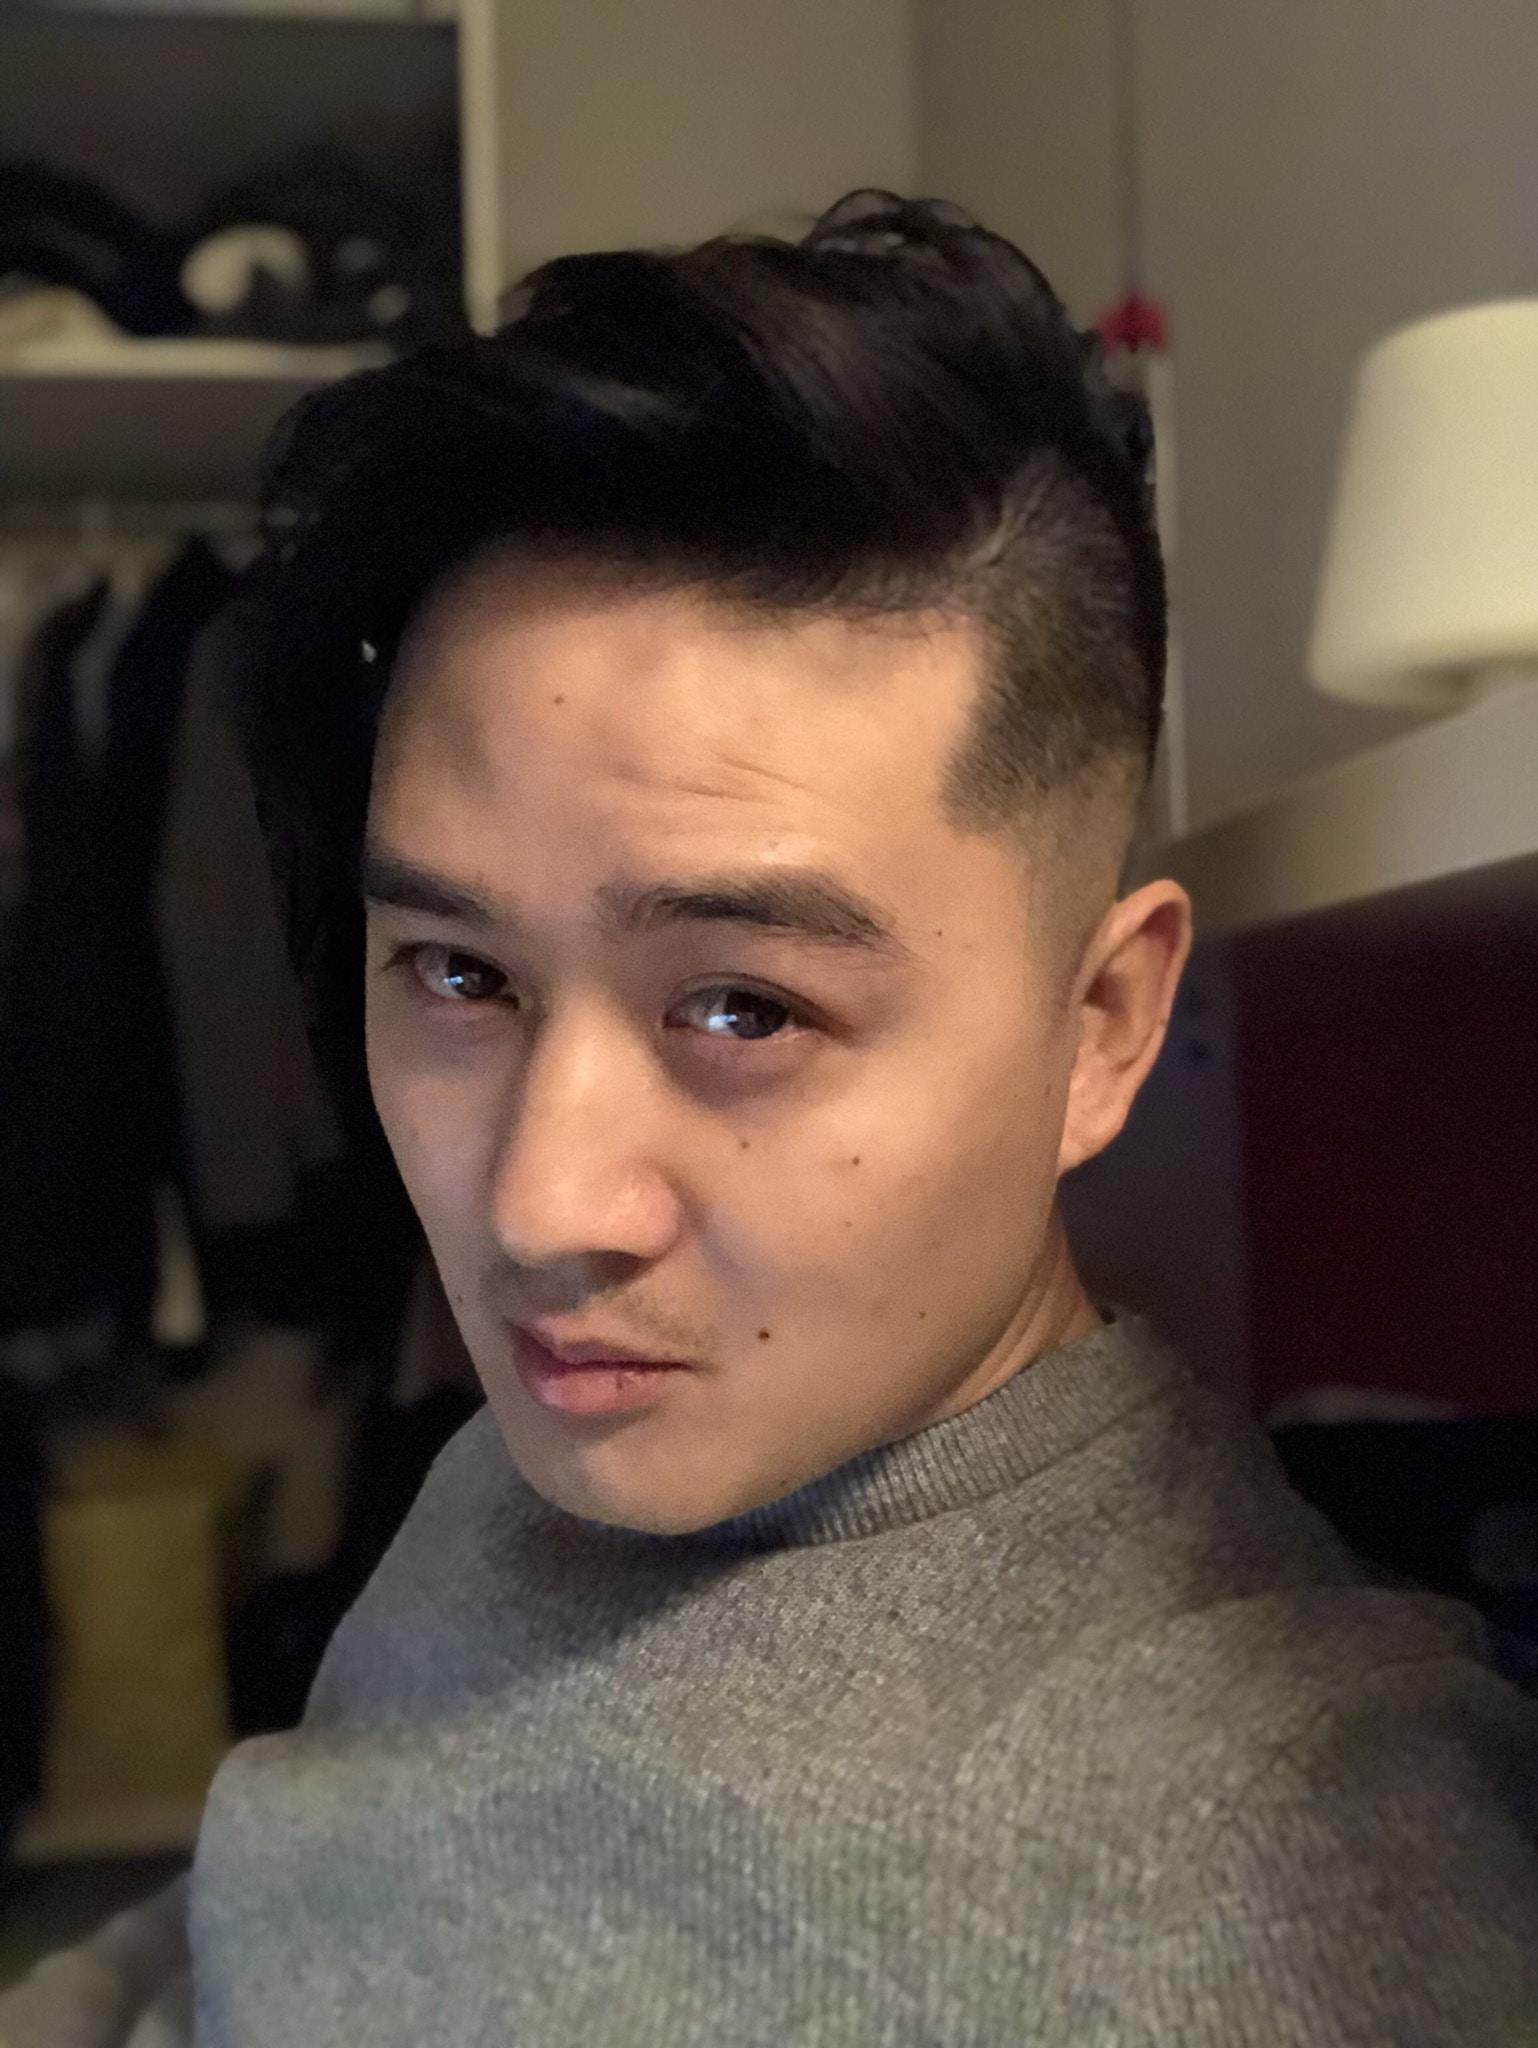 Go to LA khai-way's profile